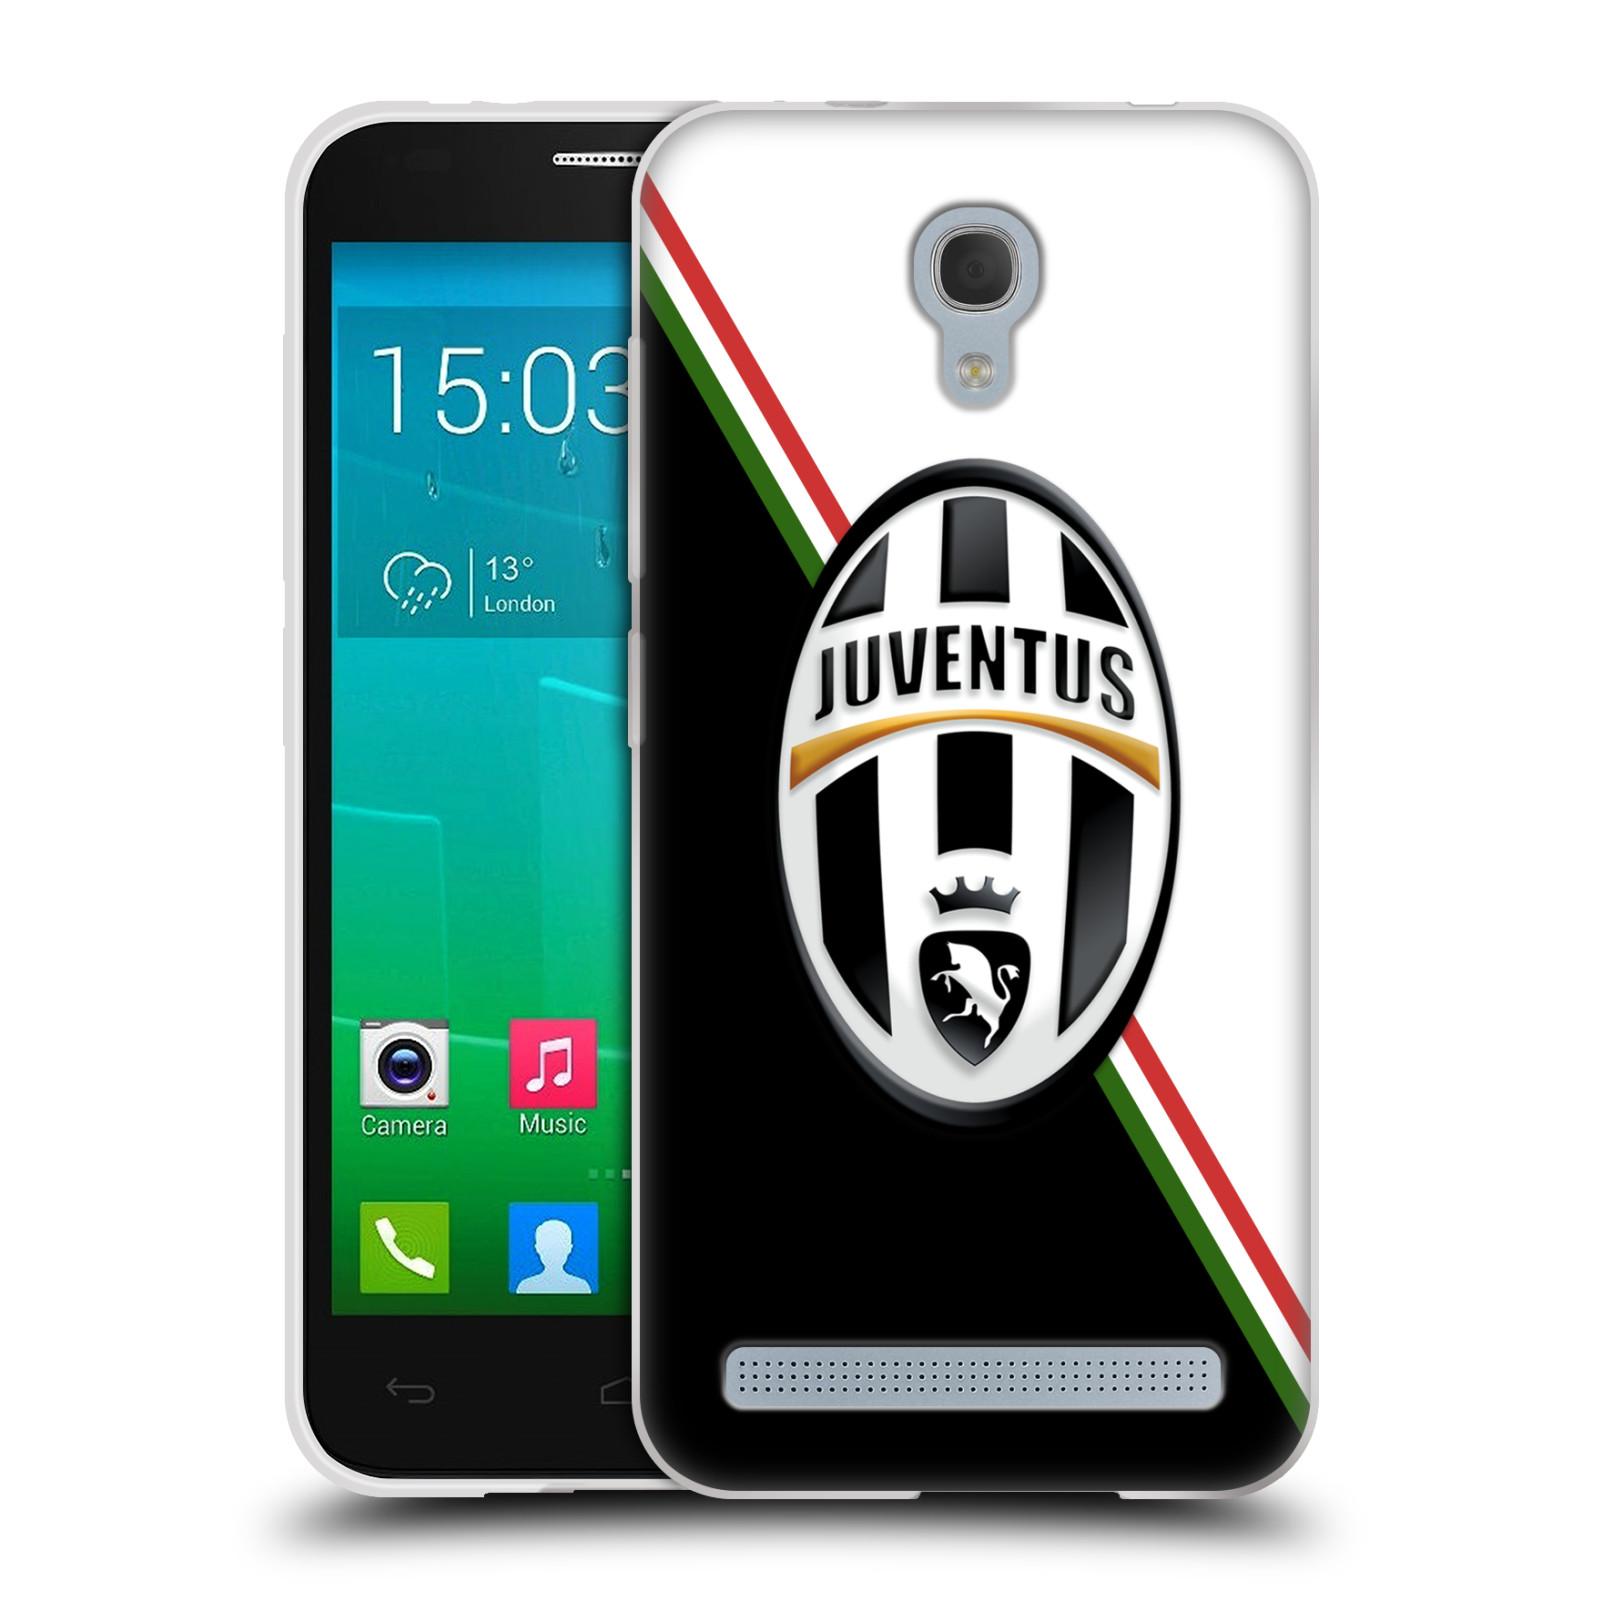 Silikonové pouzdro na mobil Alcatel One Touch Idol 2 Mini S 6036Y HEAD CASE Juventus FC - Black and White (Silikonový kryt či obal na mobilní telefon Juventus FC Official pro Alcatel Idol 2 Mini S OT-6036Y)